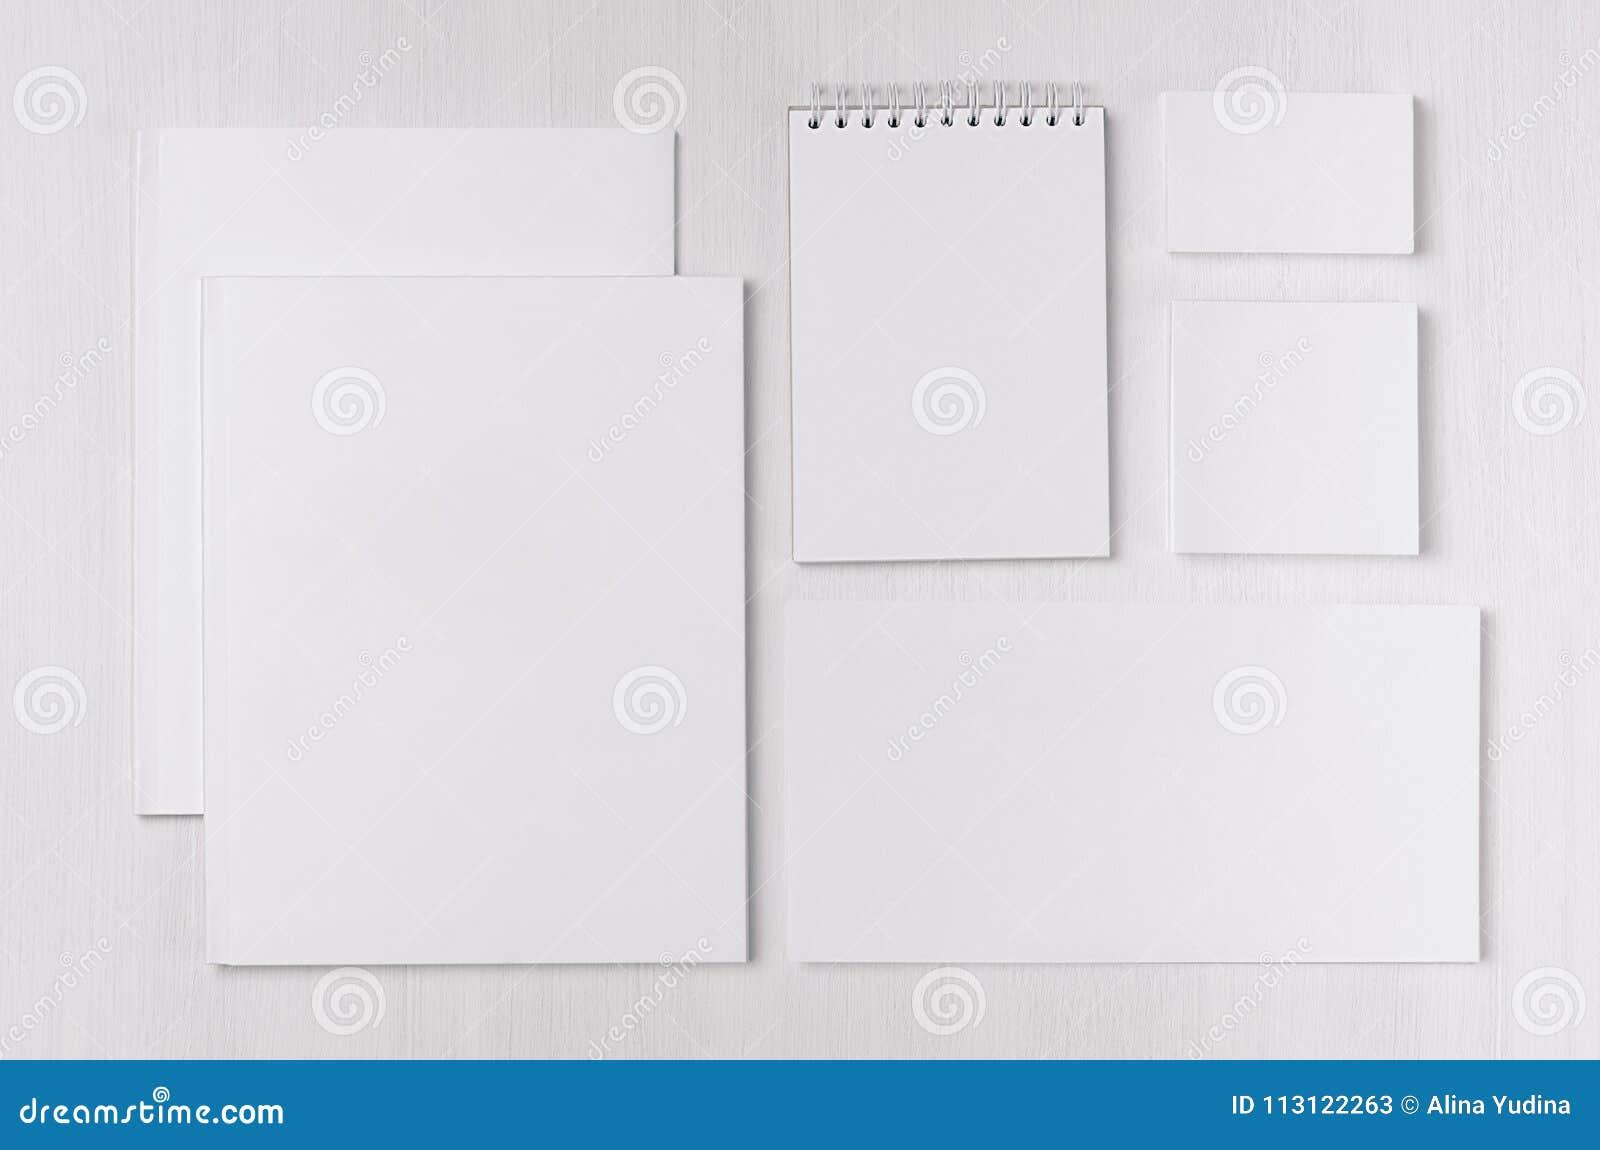 Branding business mock up of white blank stationery set on light soft white wooden background.